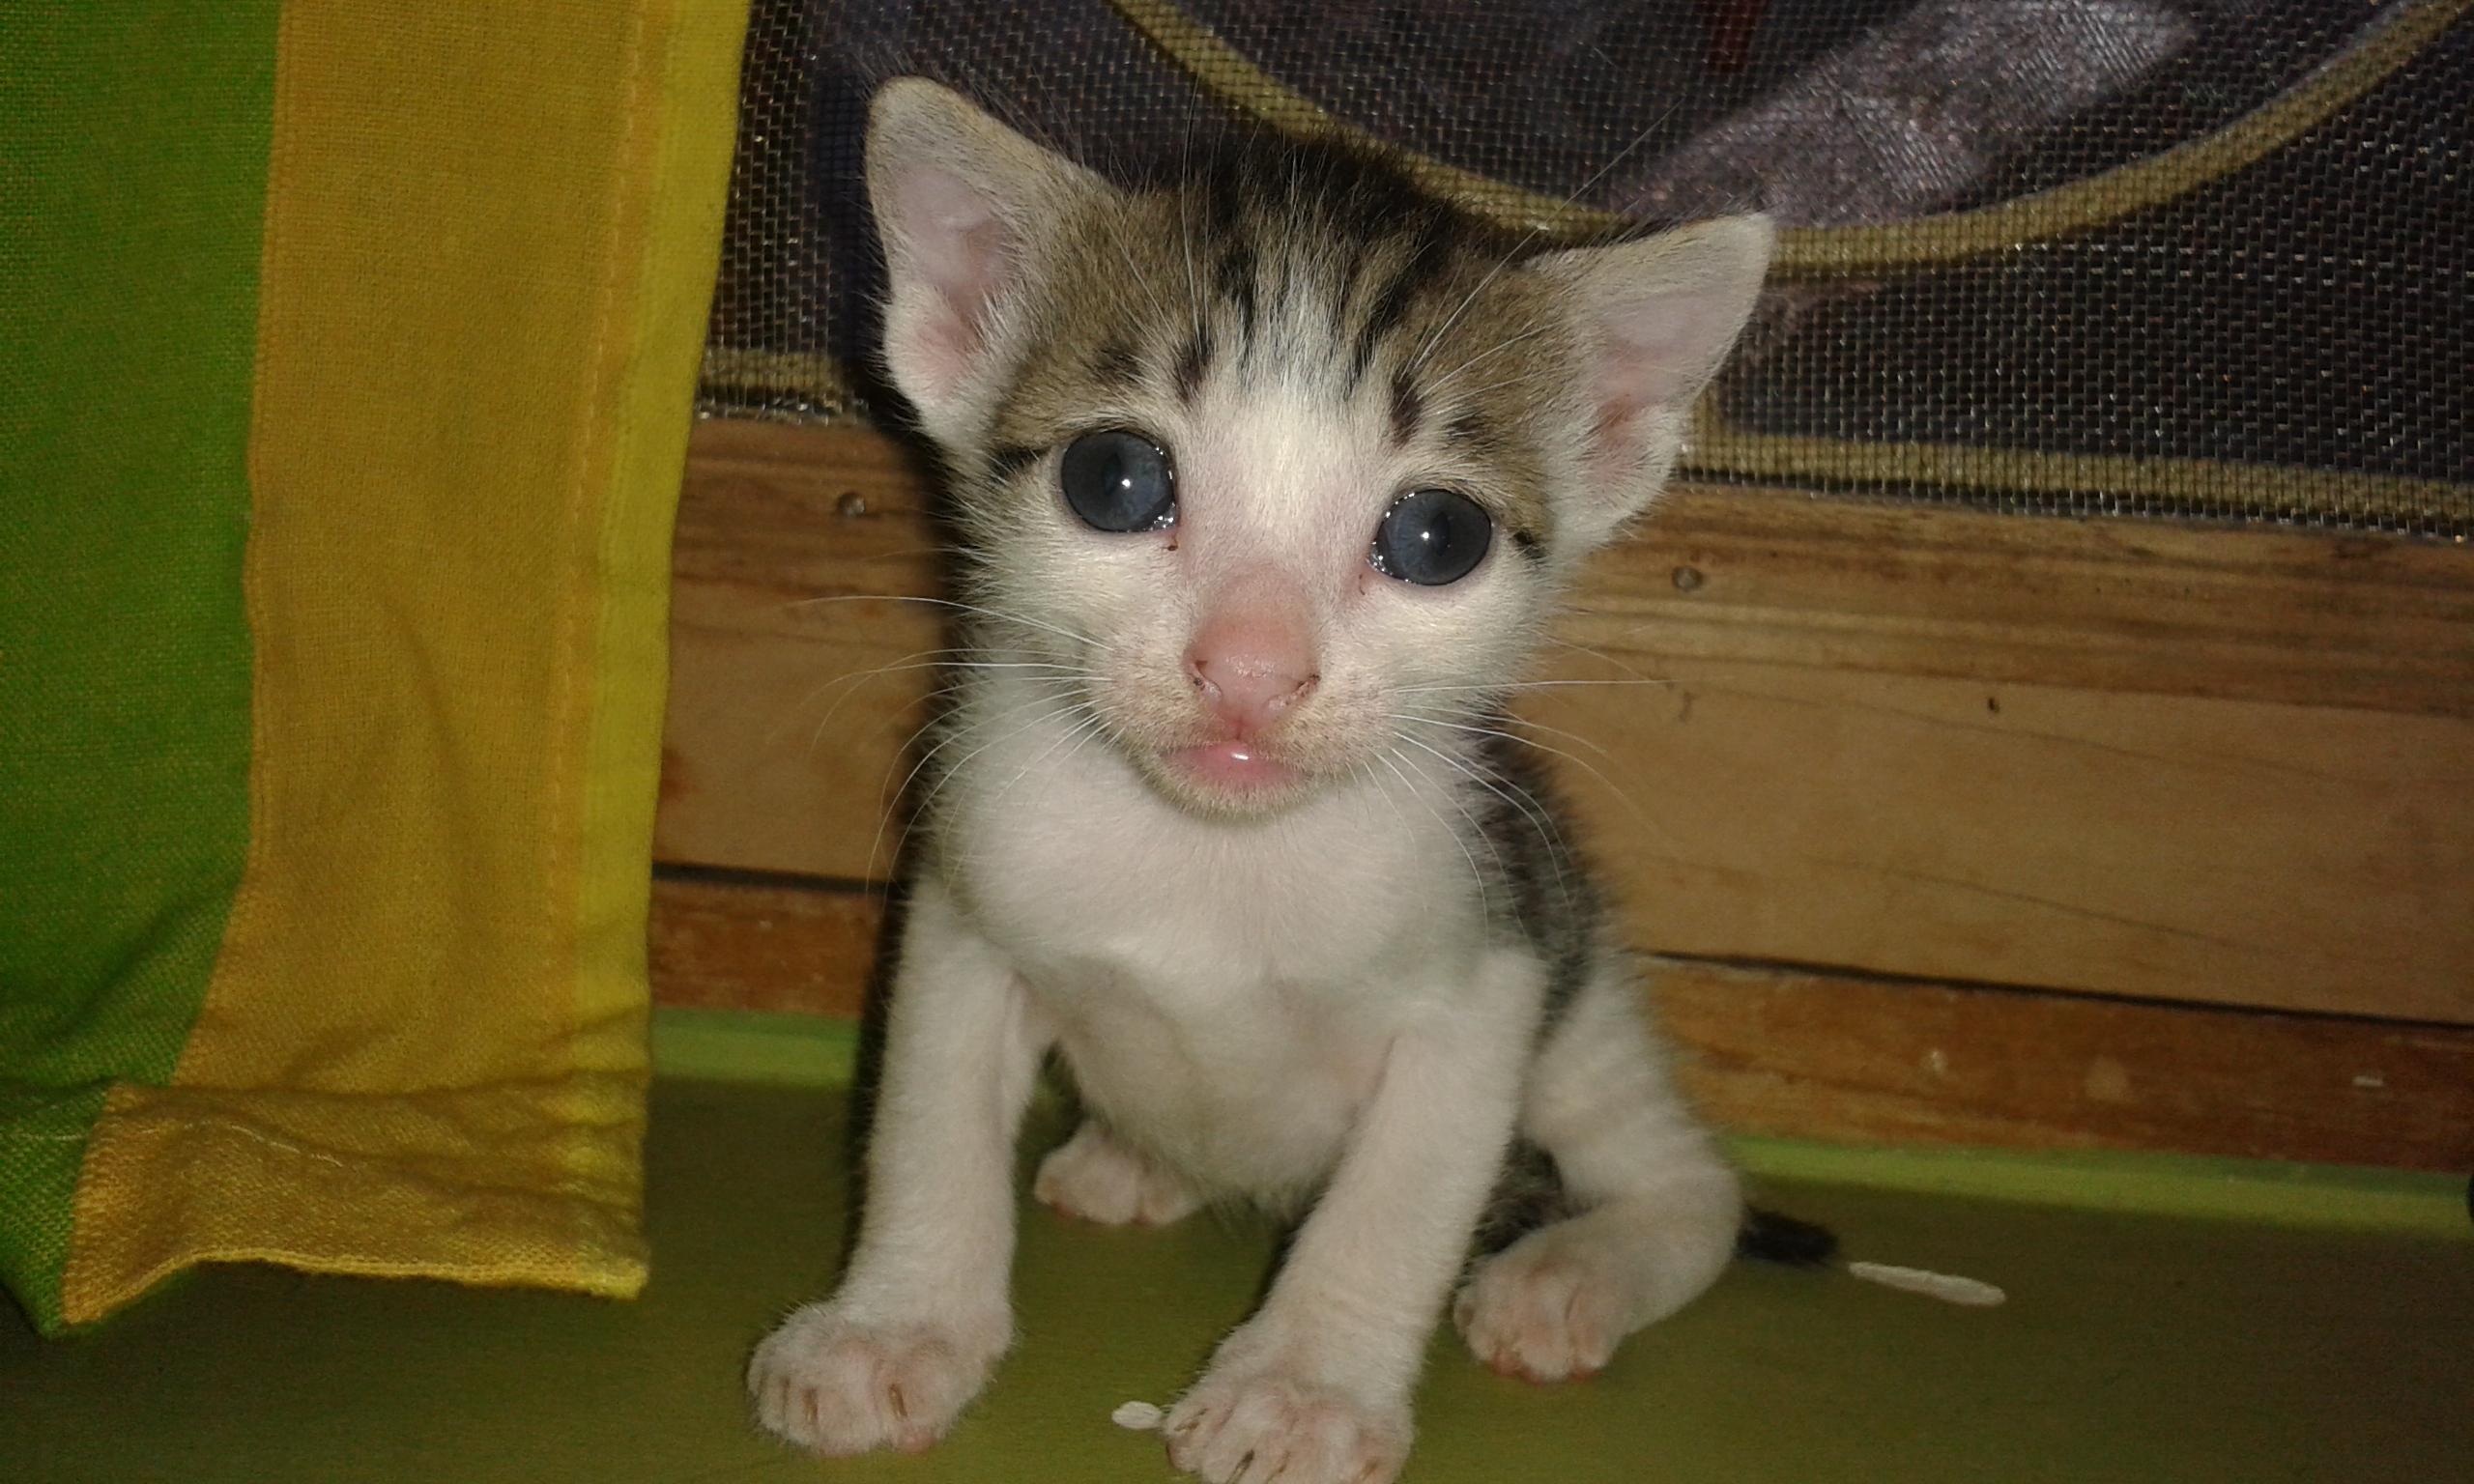 Cute kitty, Cat, Kitten, Kitty, Young, HQ Photo